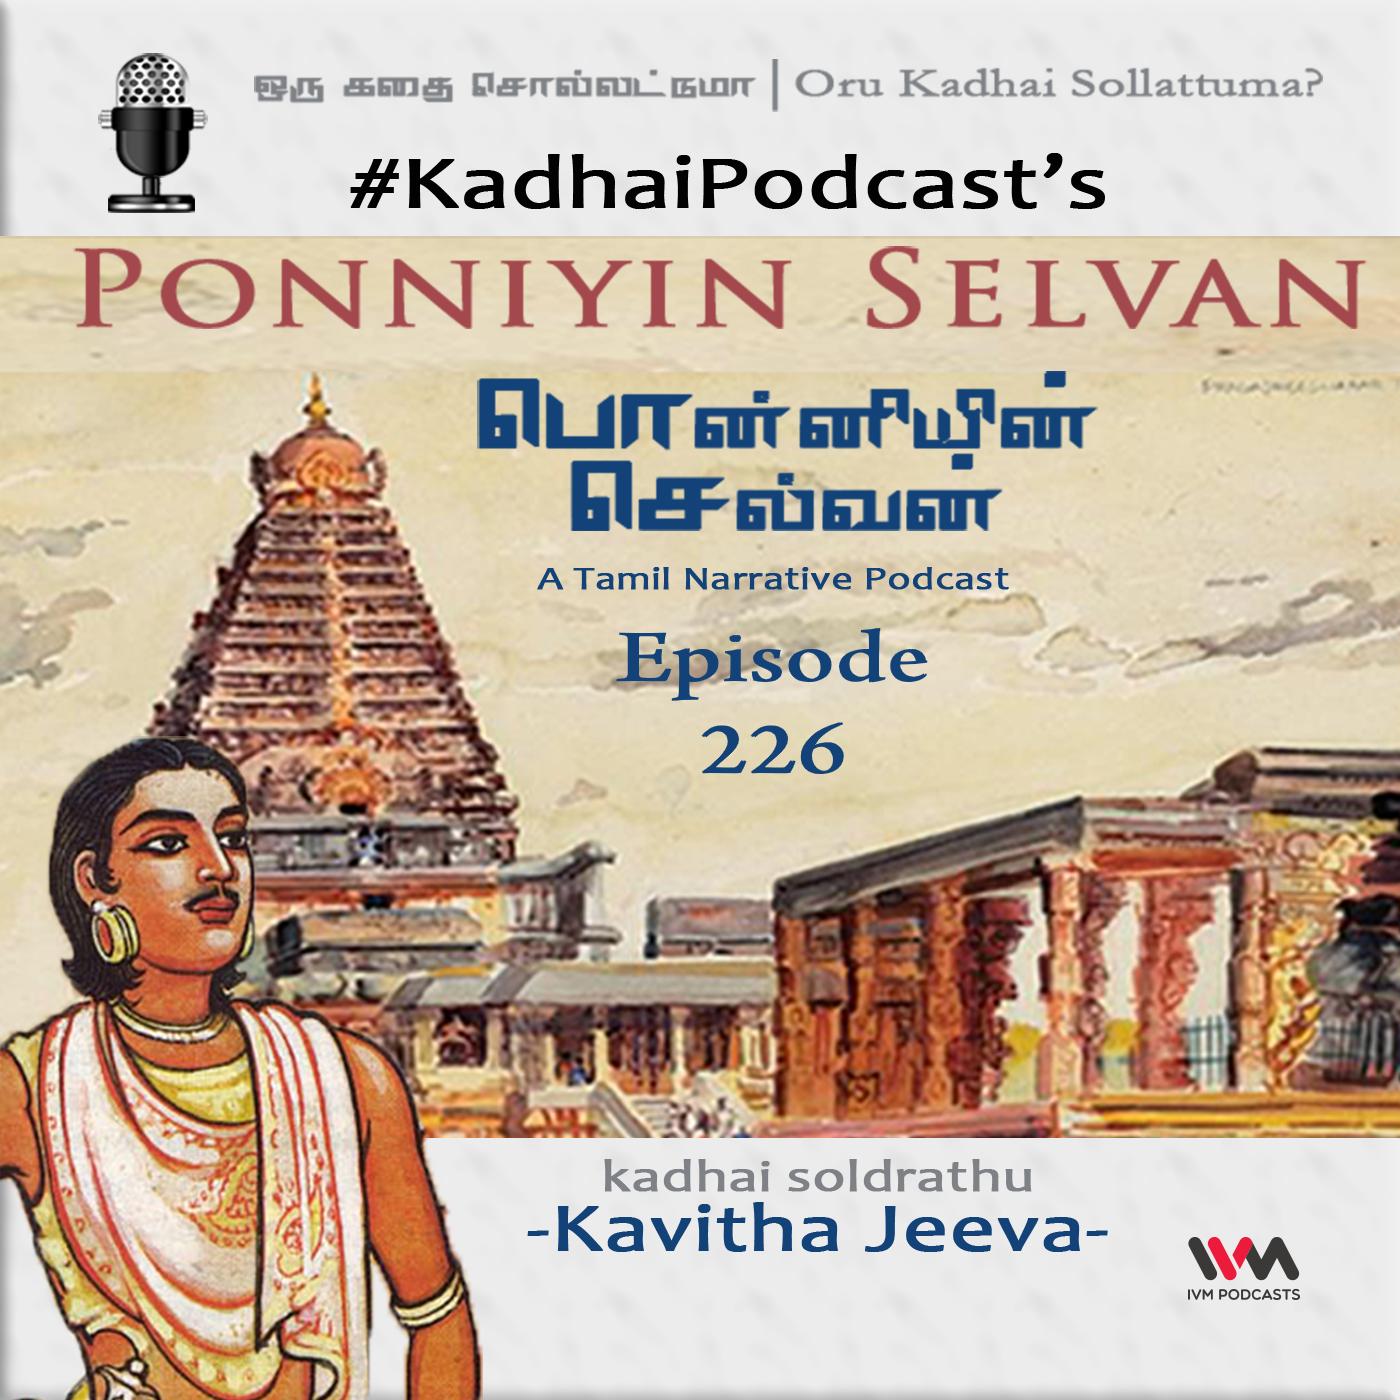 KadhaiPodcast's Ponniyin Selvan - Episode # 226